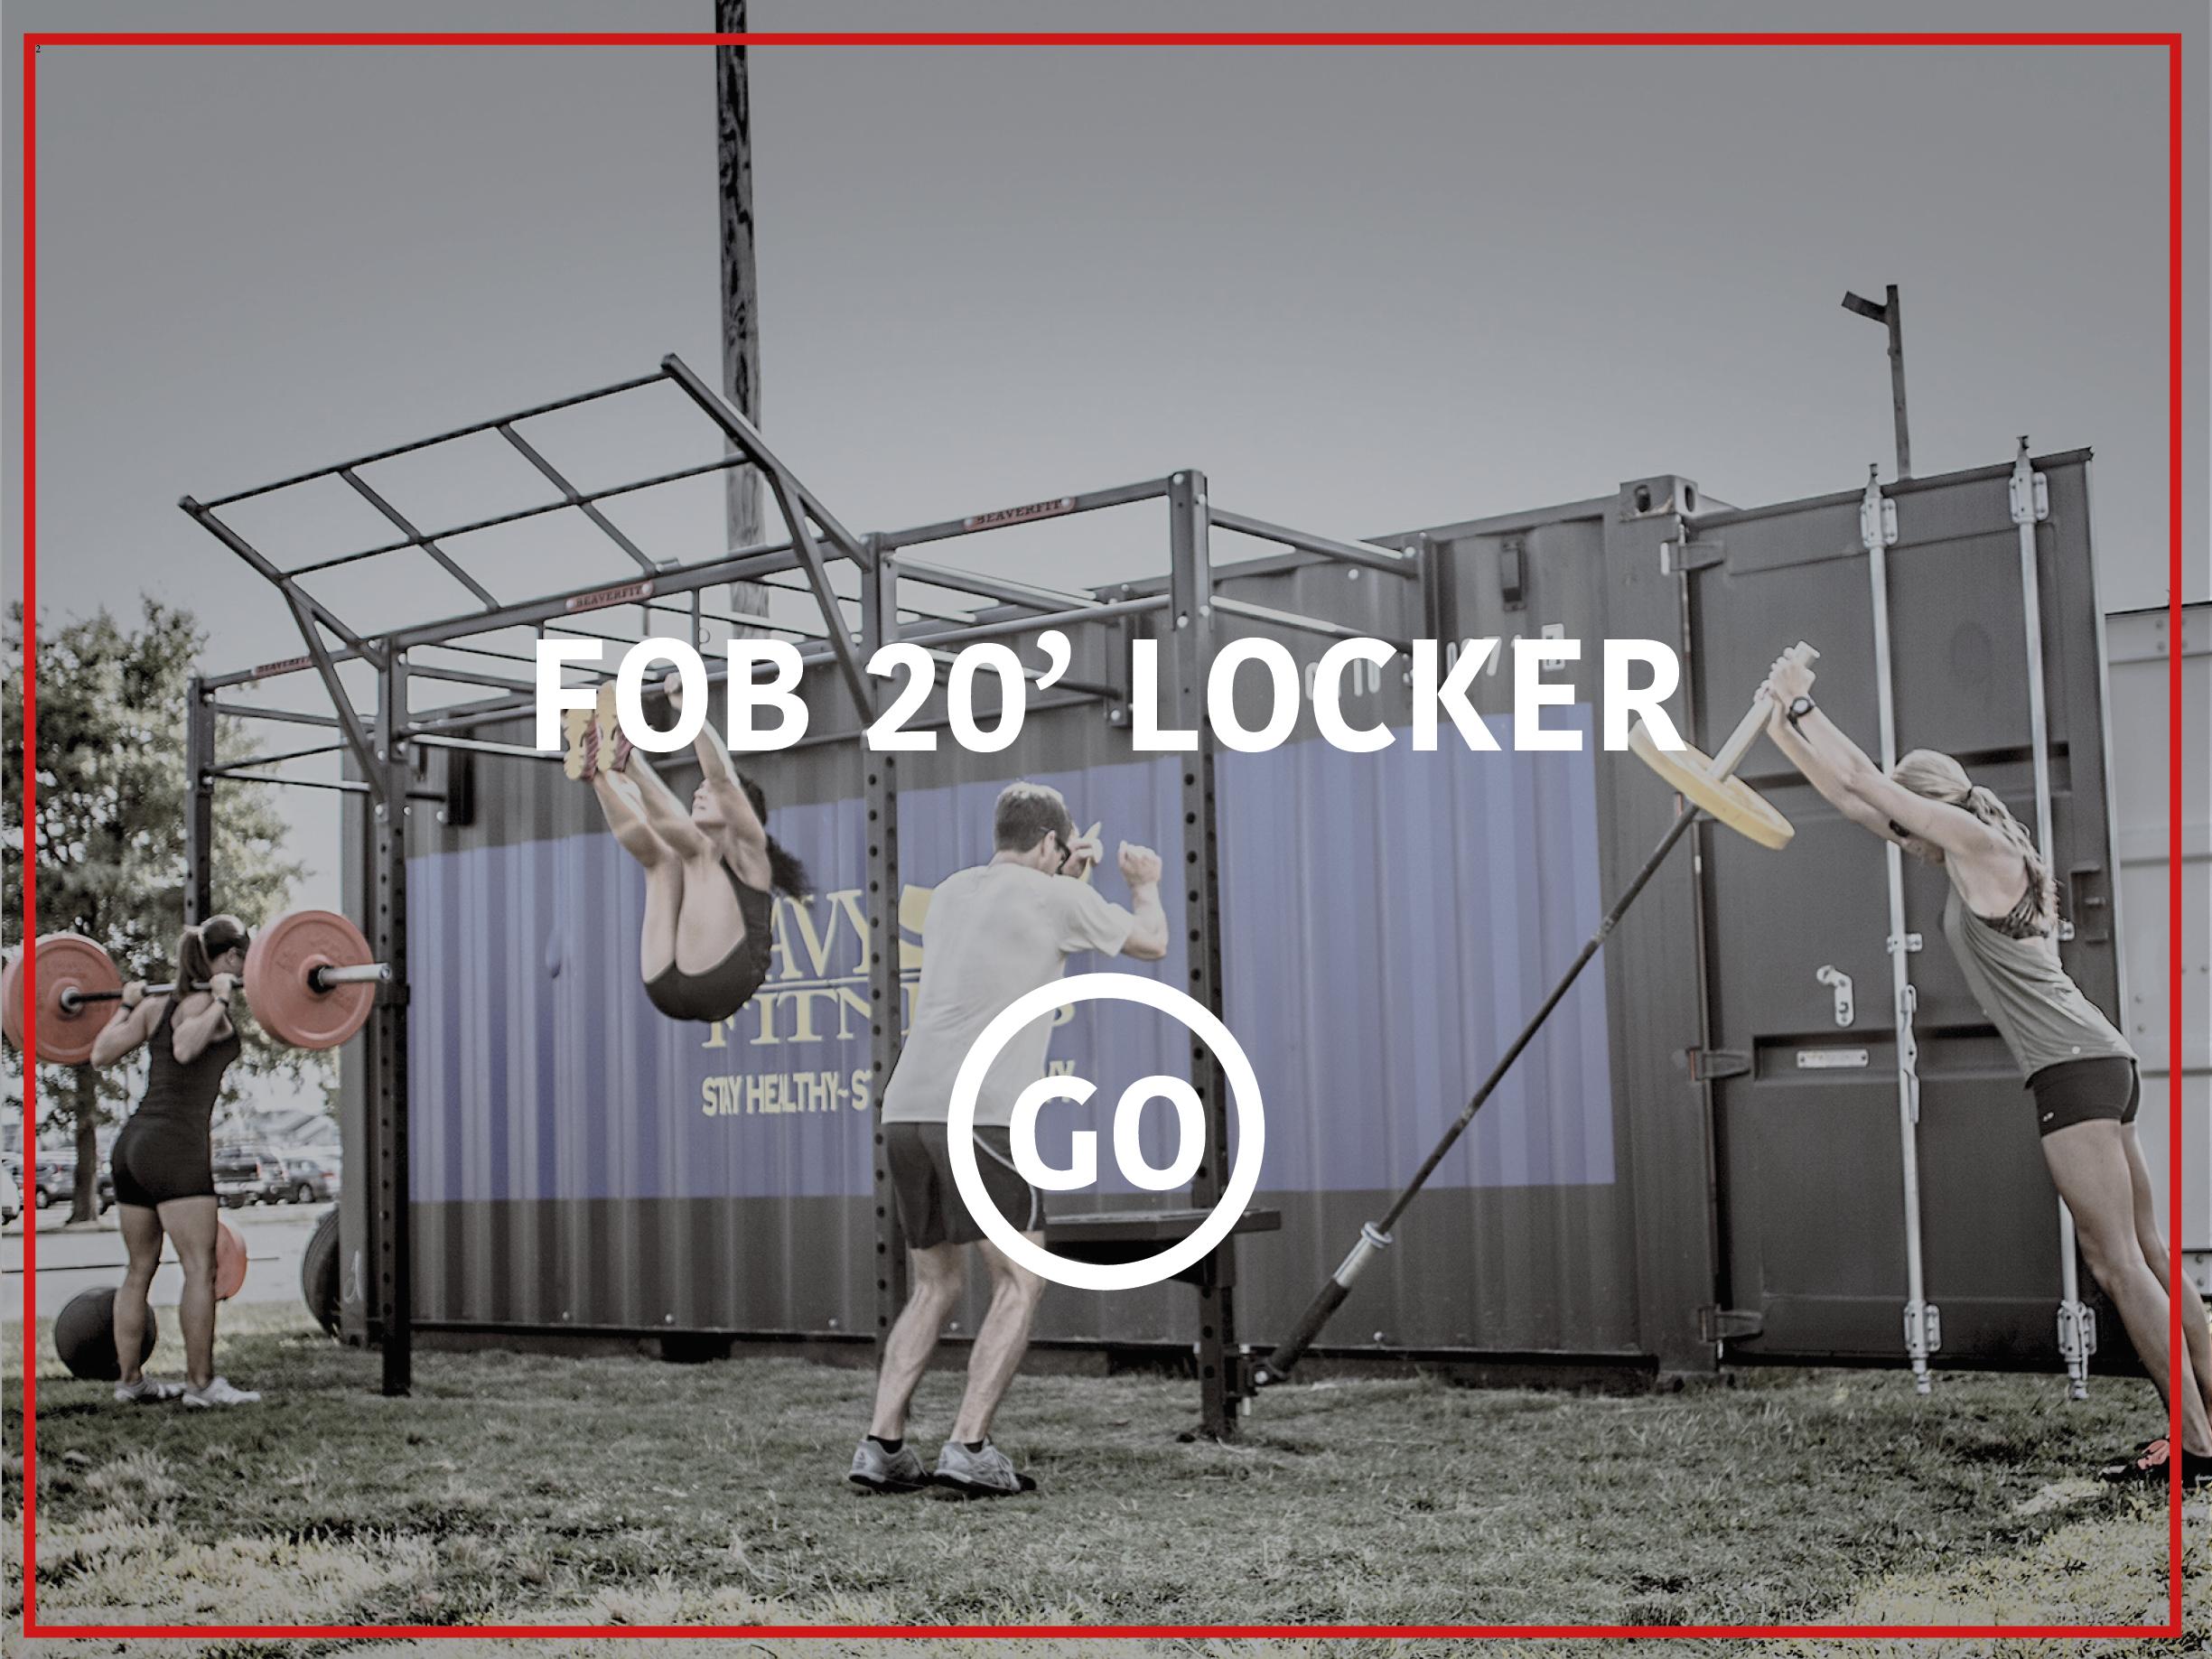 20' Deployable Lockers